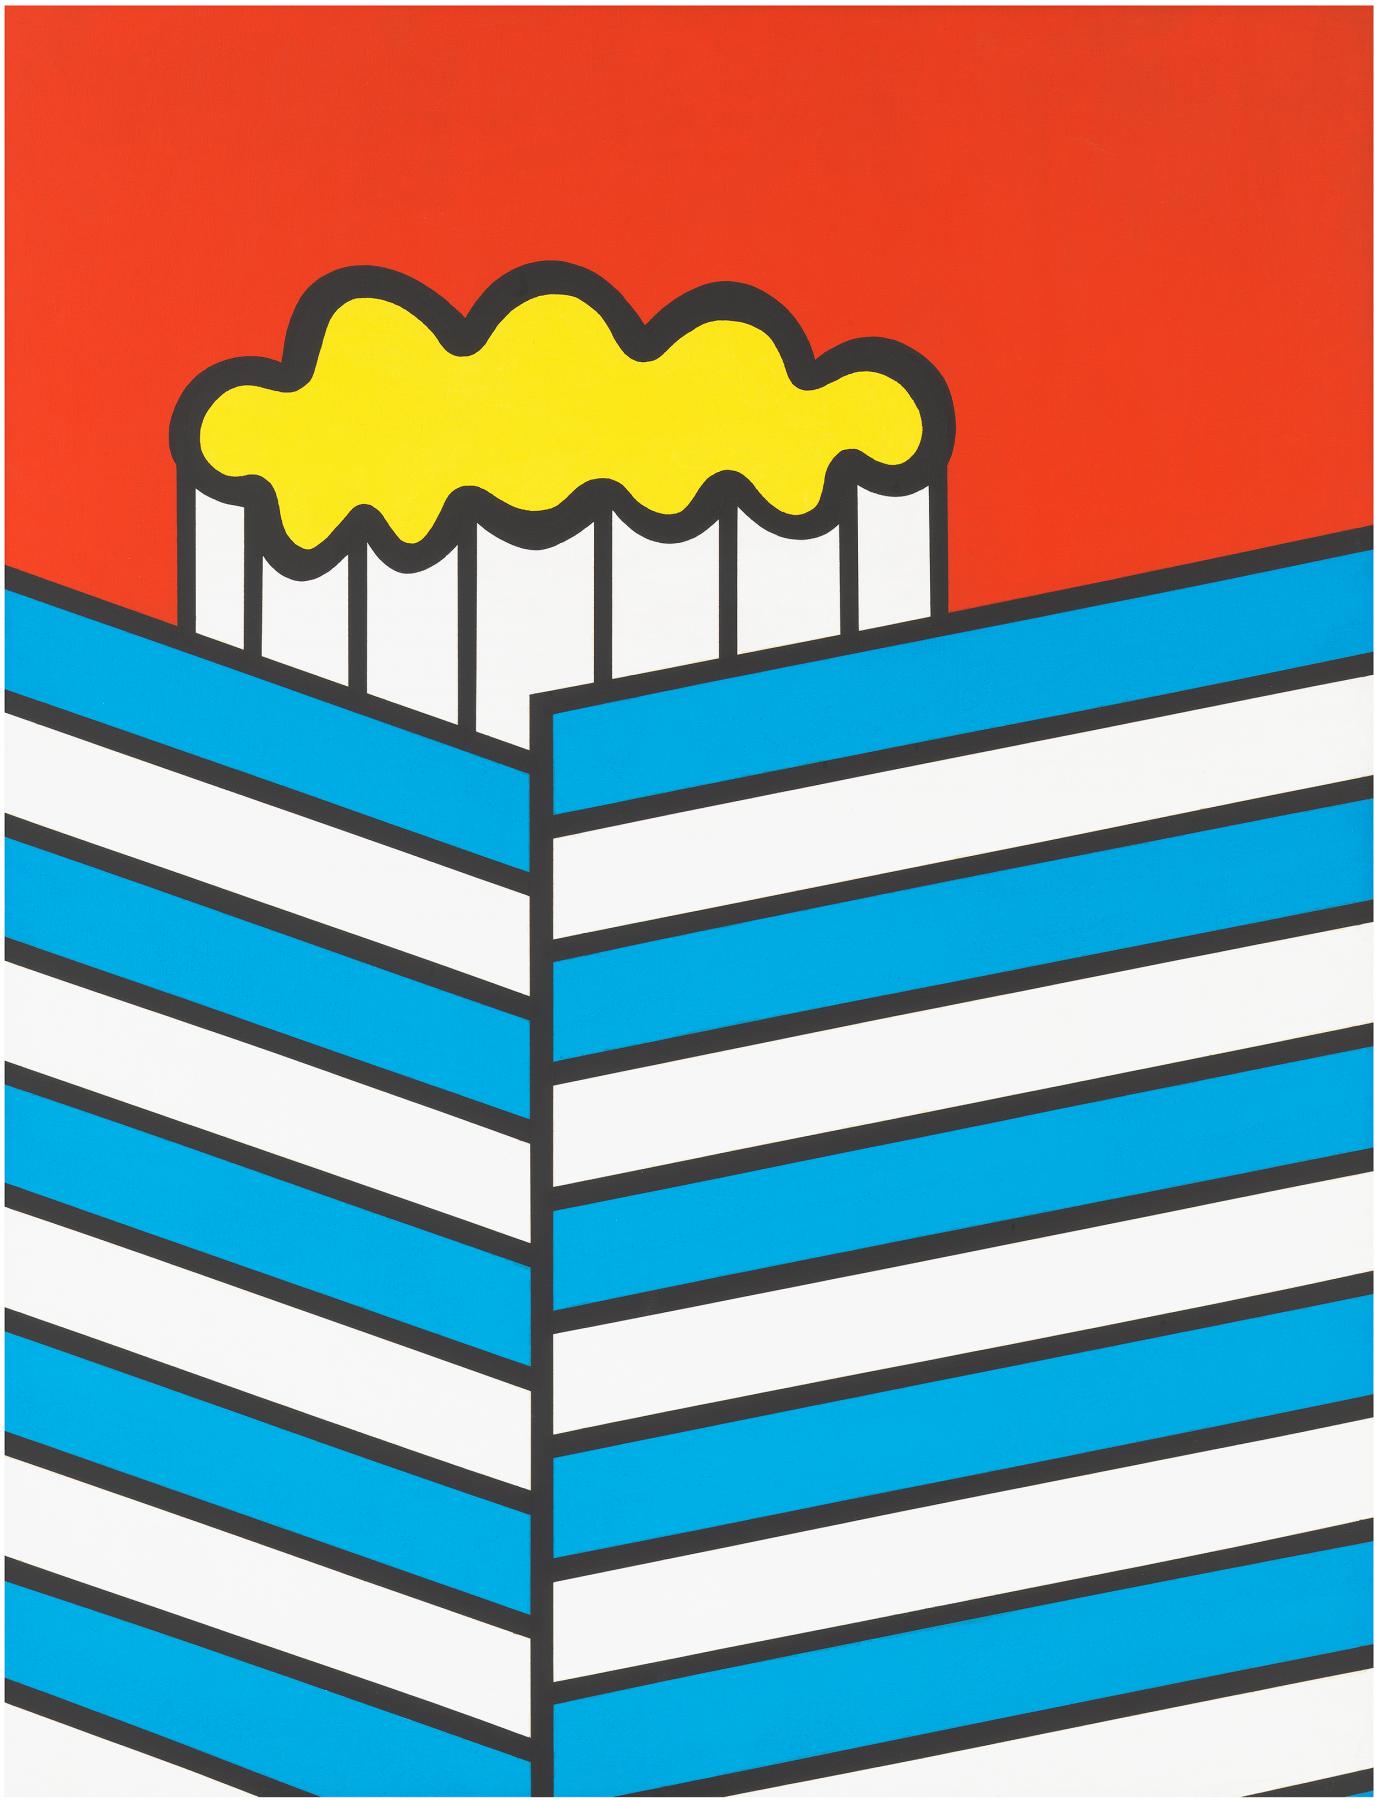 United Color Kit, 1967, Acrylic on canvas